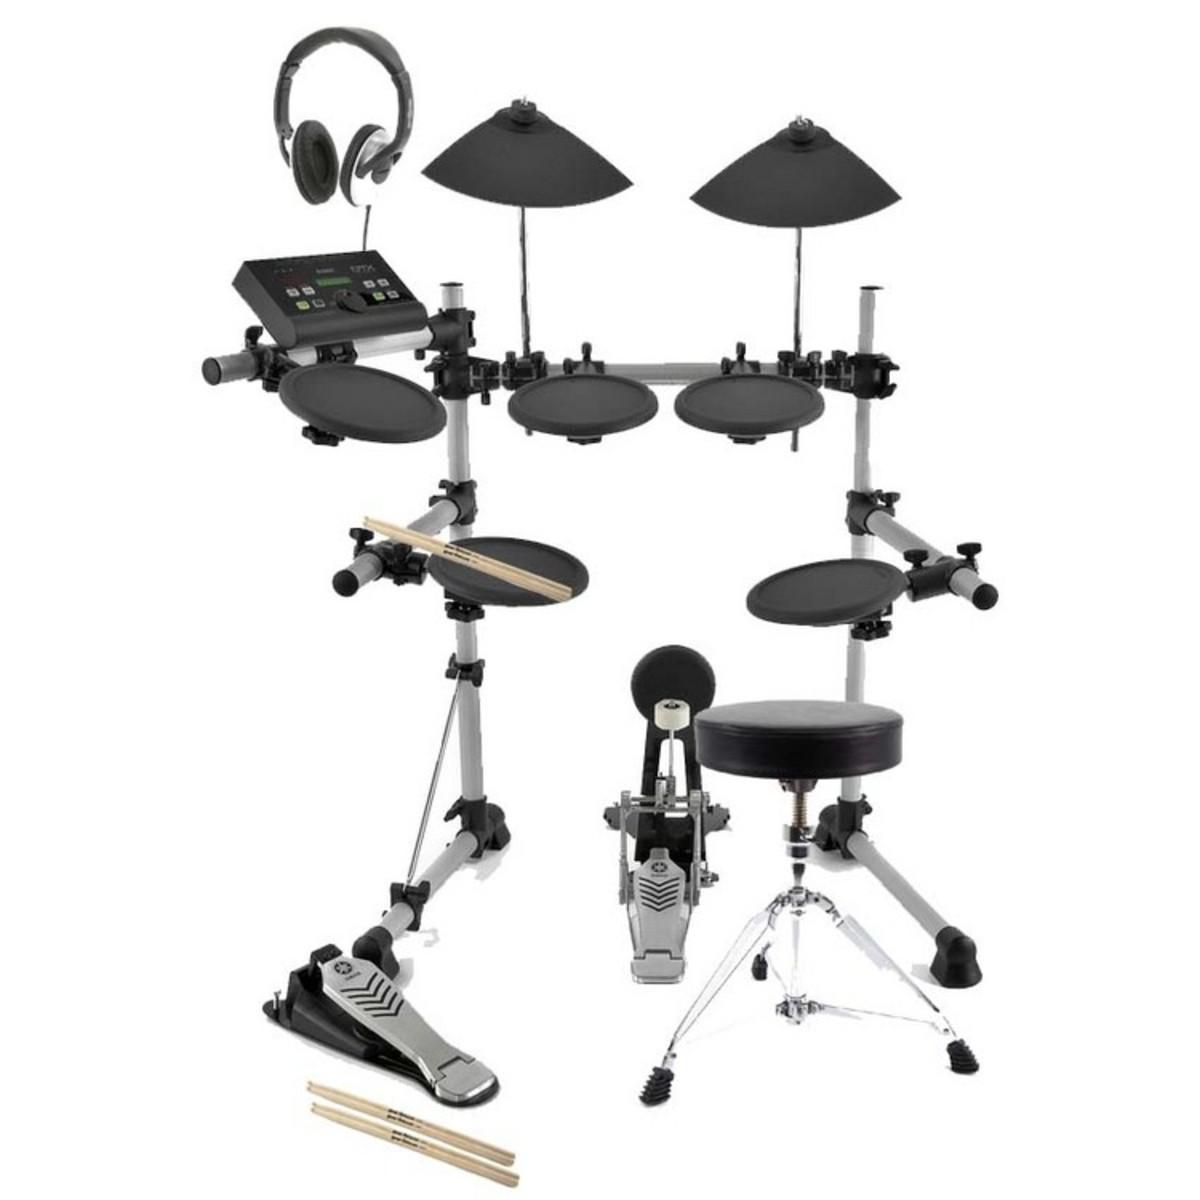 Disc Yamaha Dtx500k Electronic Drum Kit With Free